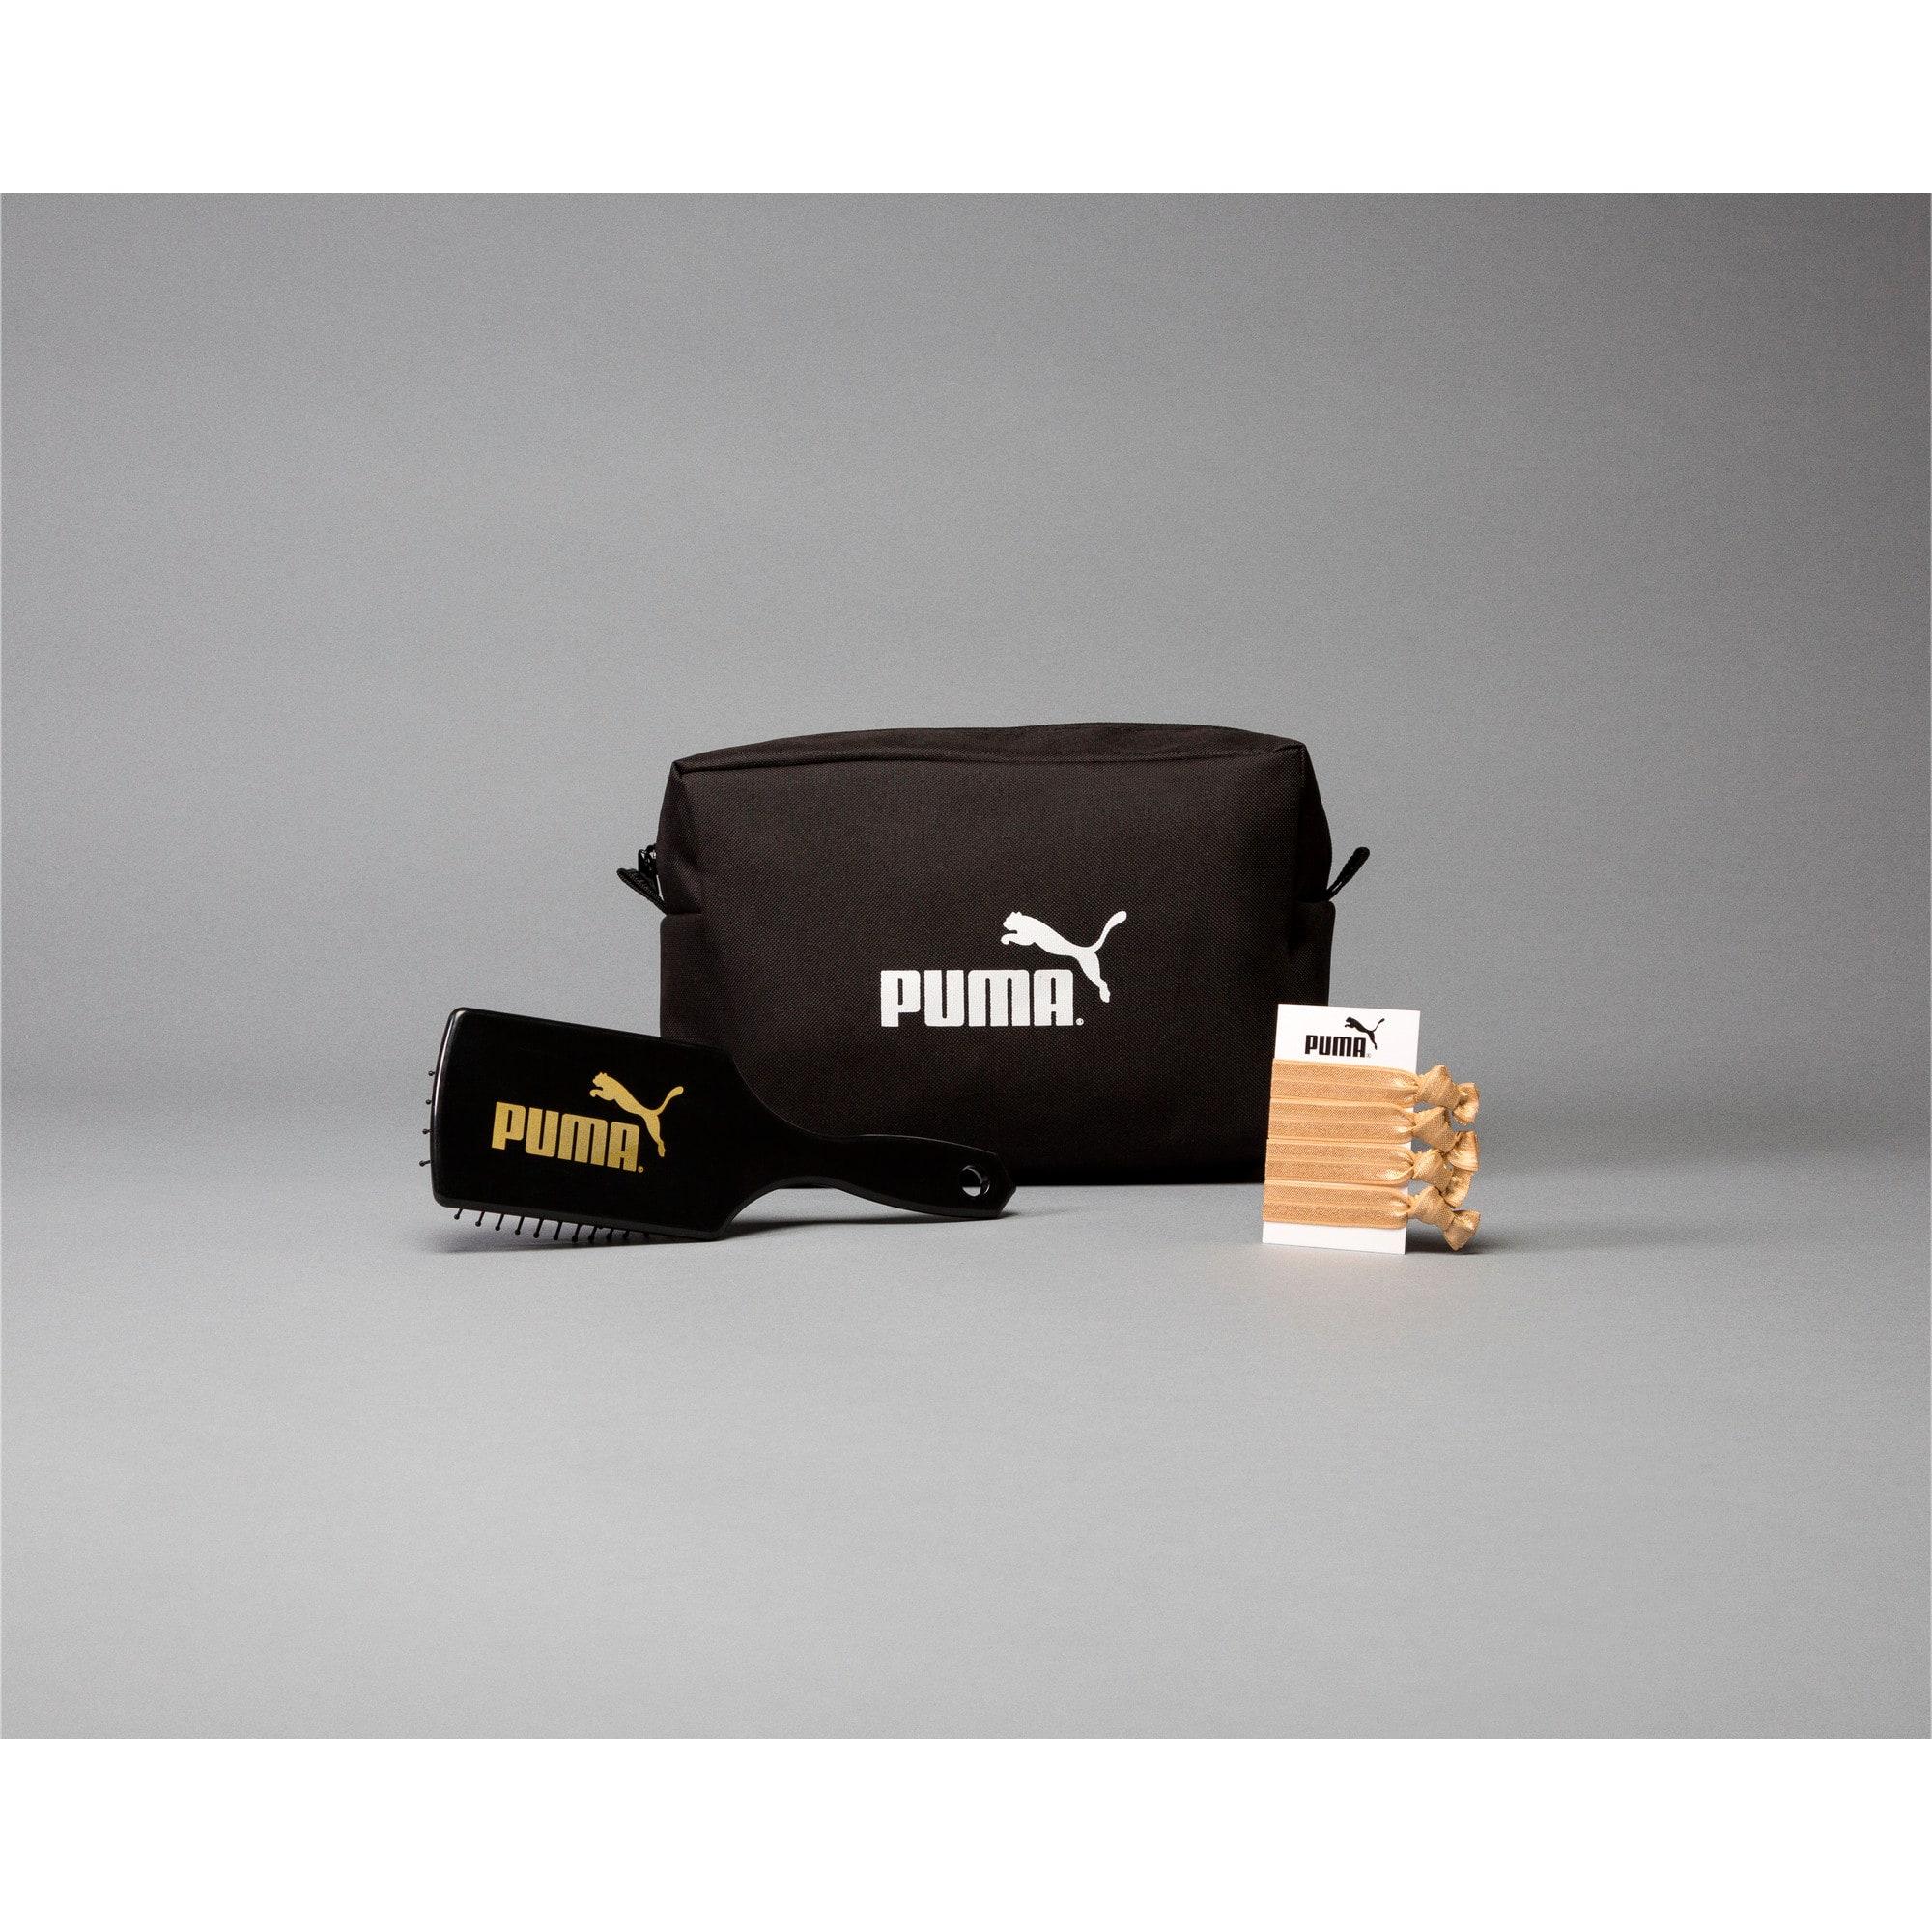 Thumbnail 1 of PUMA-Branded Makeup Bag, Black, medium